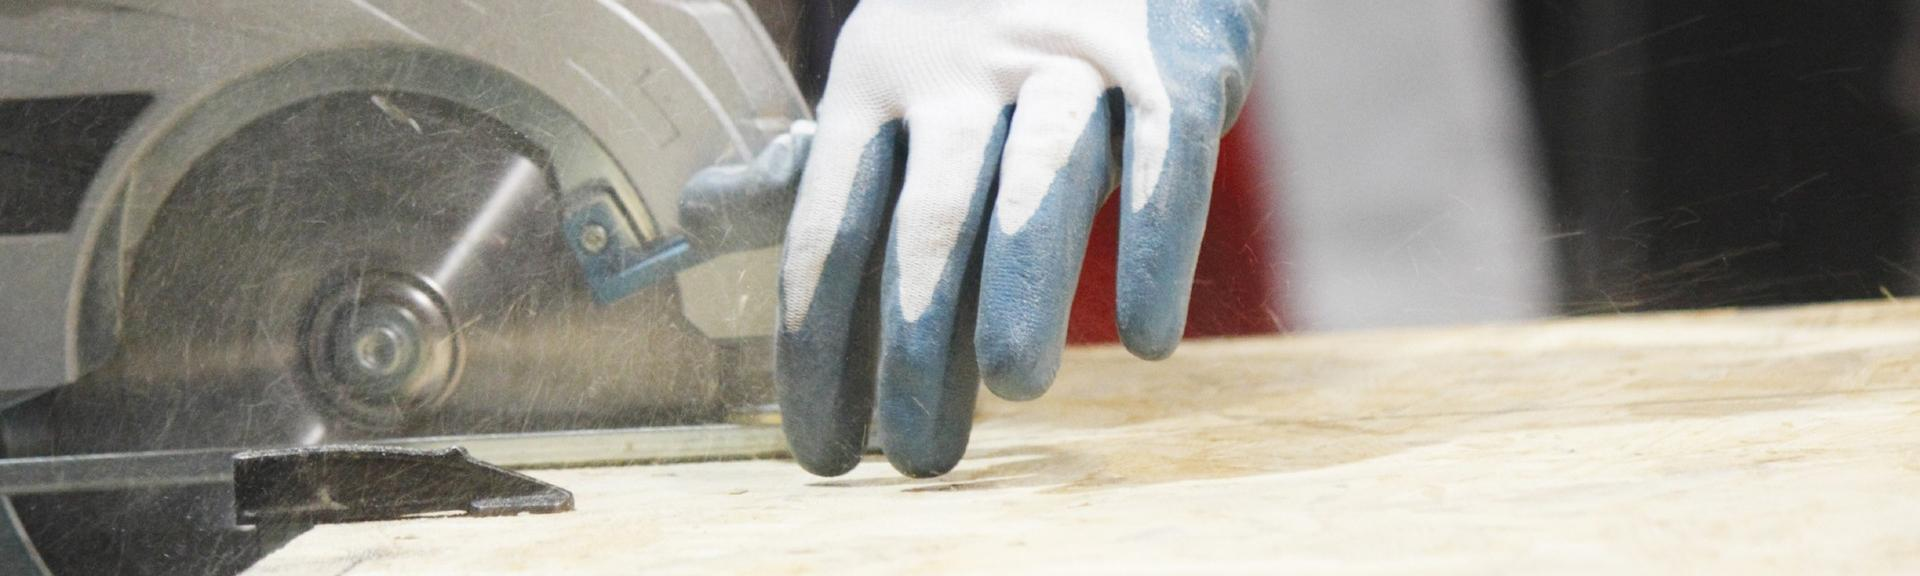 Accident de la main